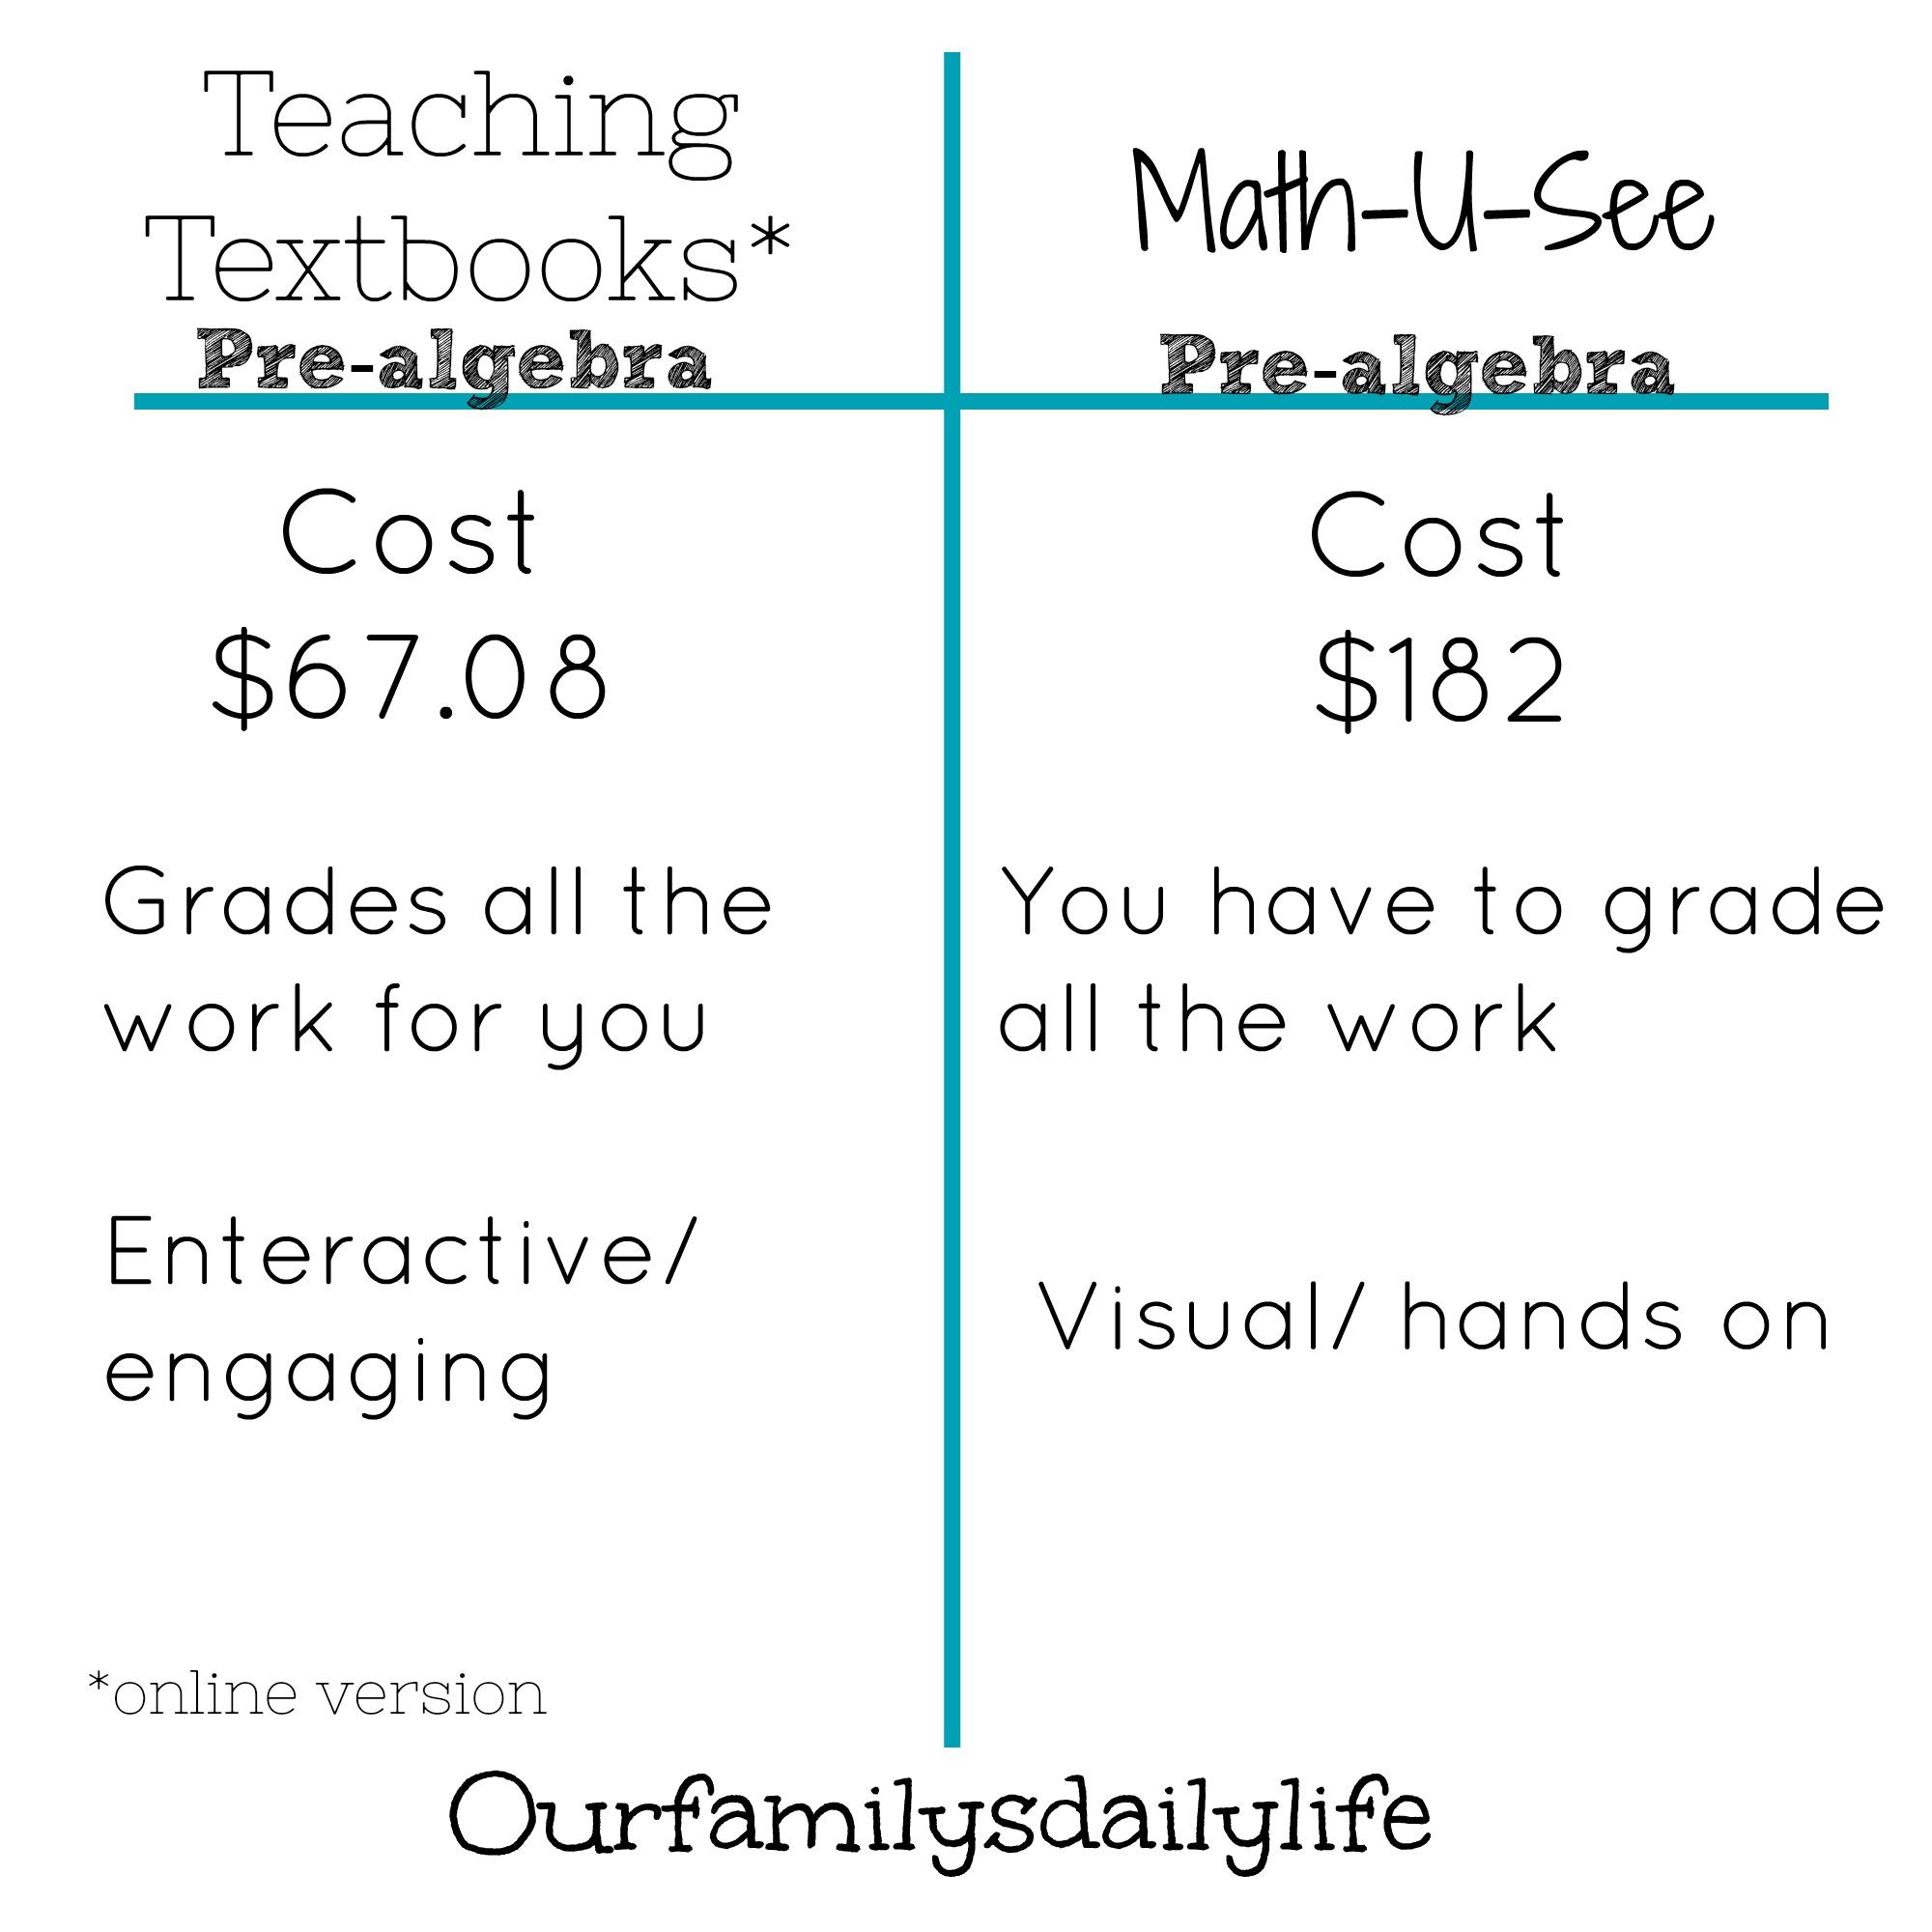 teaching textbooks math you see chart